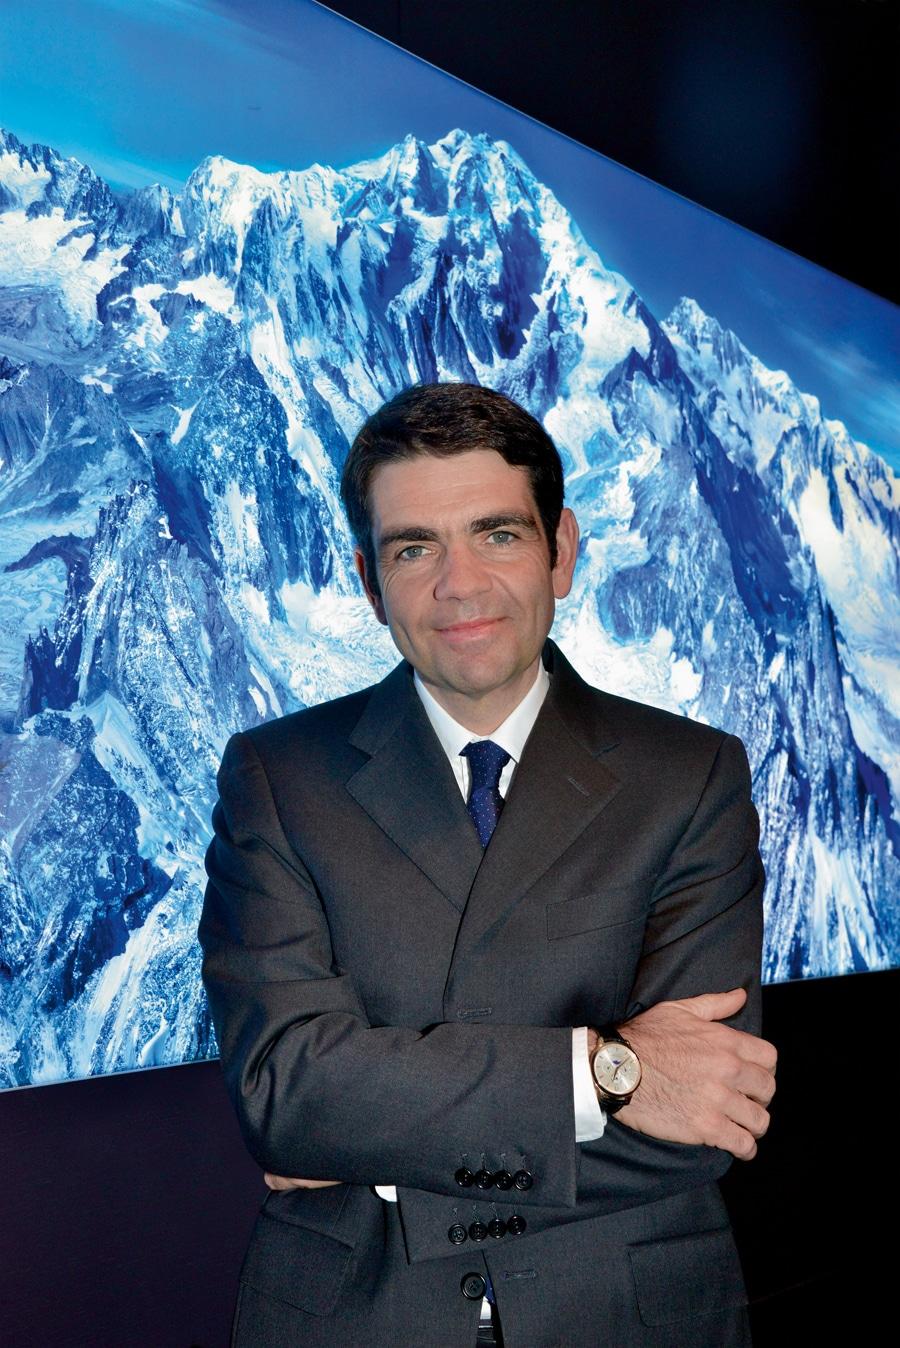 Montblanc: CEO Jérôme Lambert